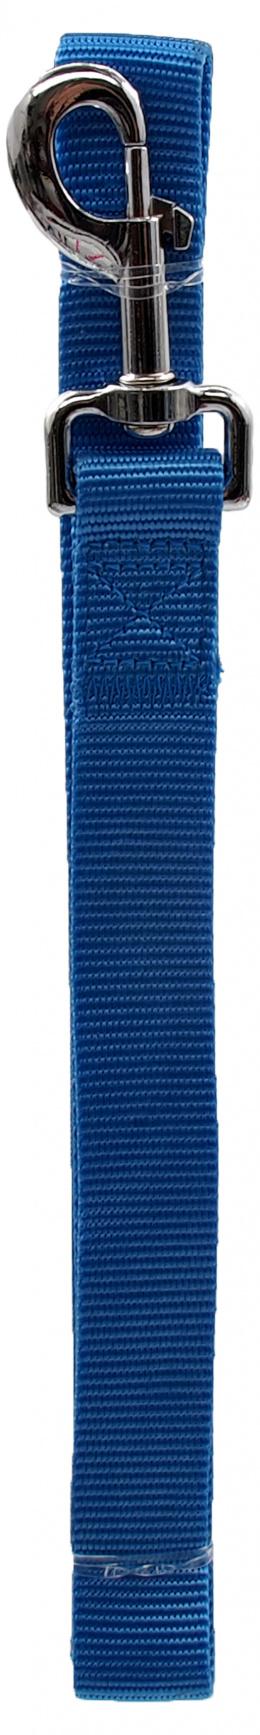 Поводок – Dog Fantasy L, 120 см, цвет - синий